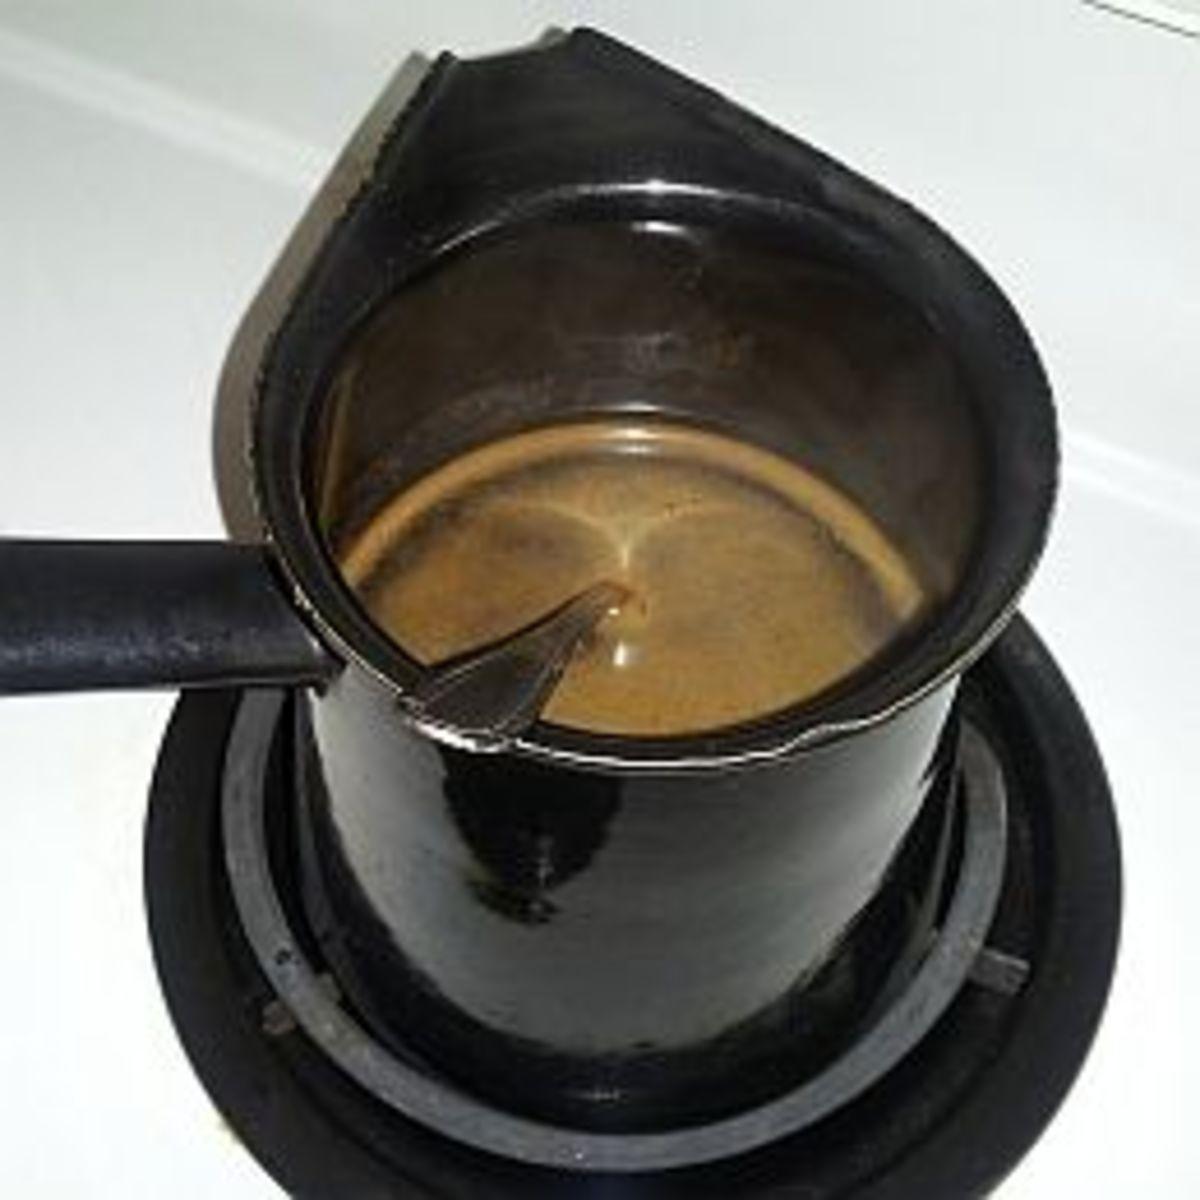 Coffee Ibrik on the Stove - Credit Dorian Bodnariuc